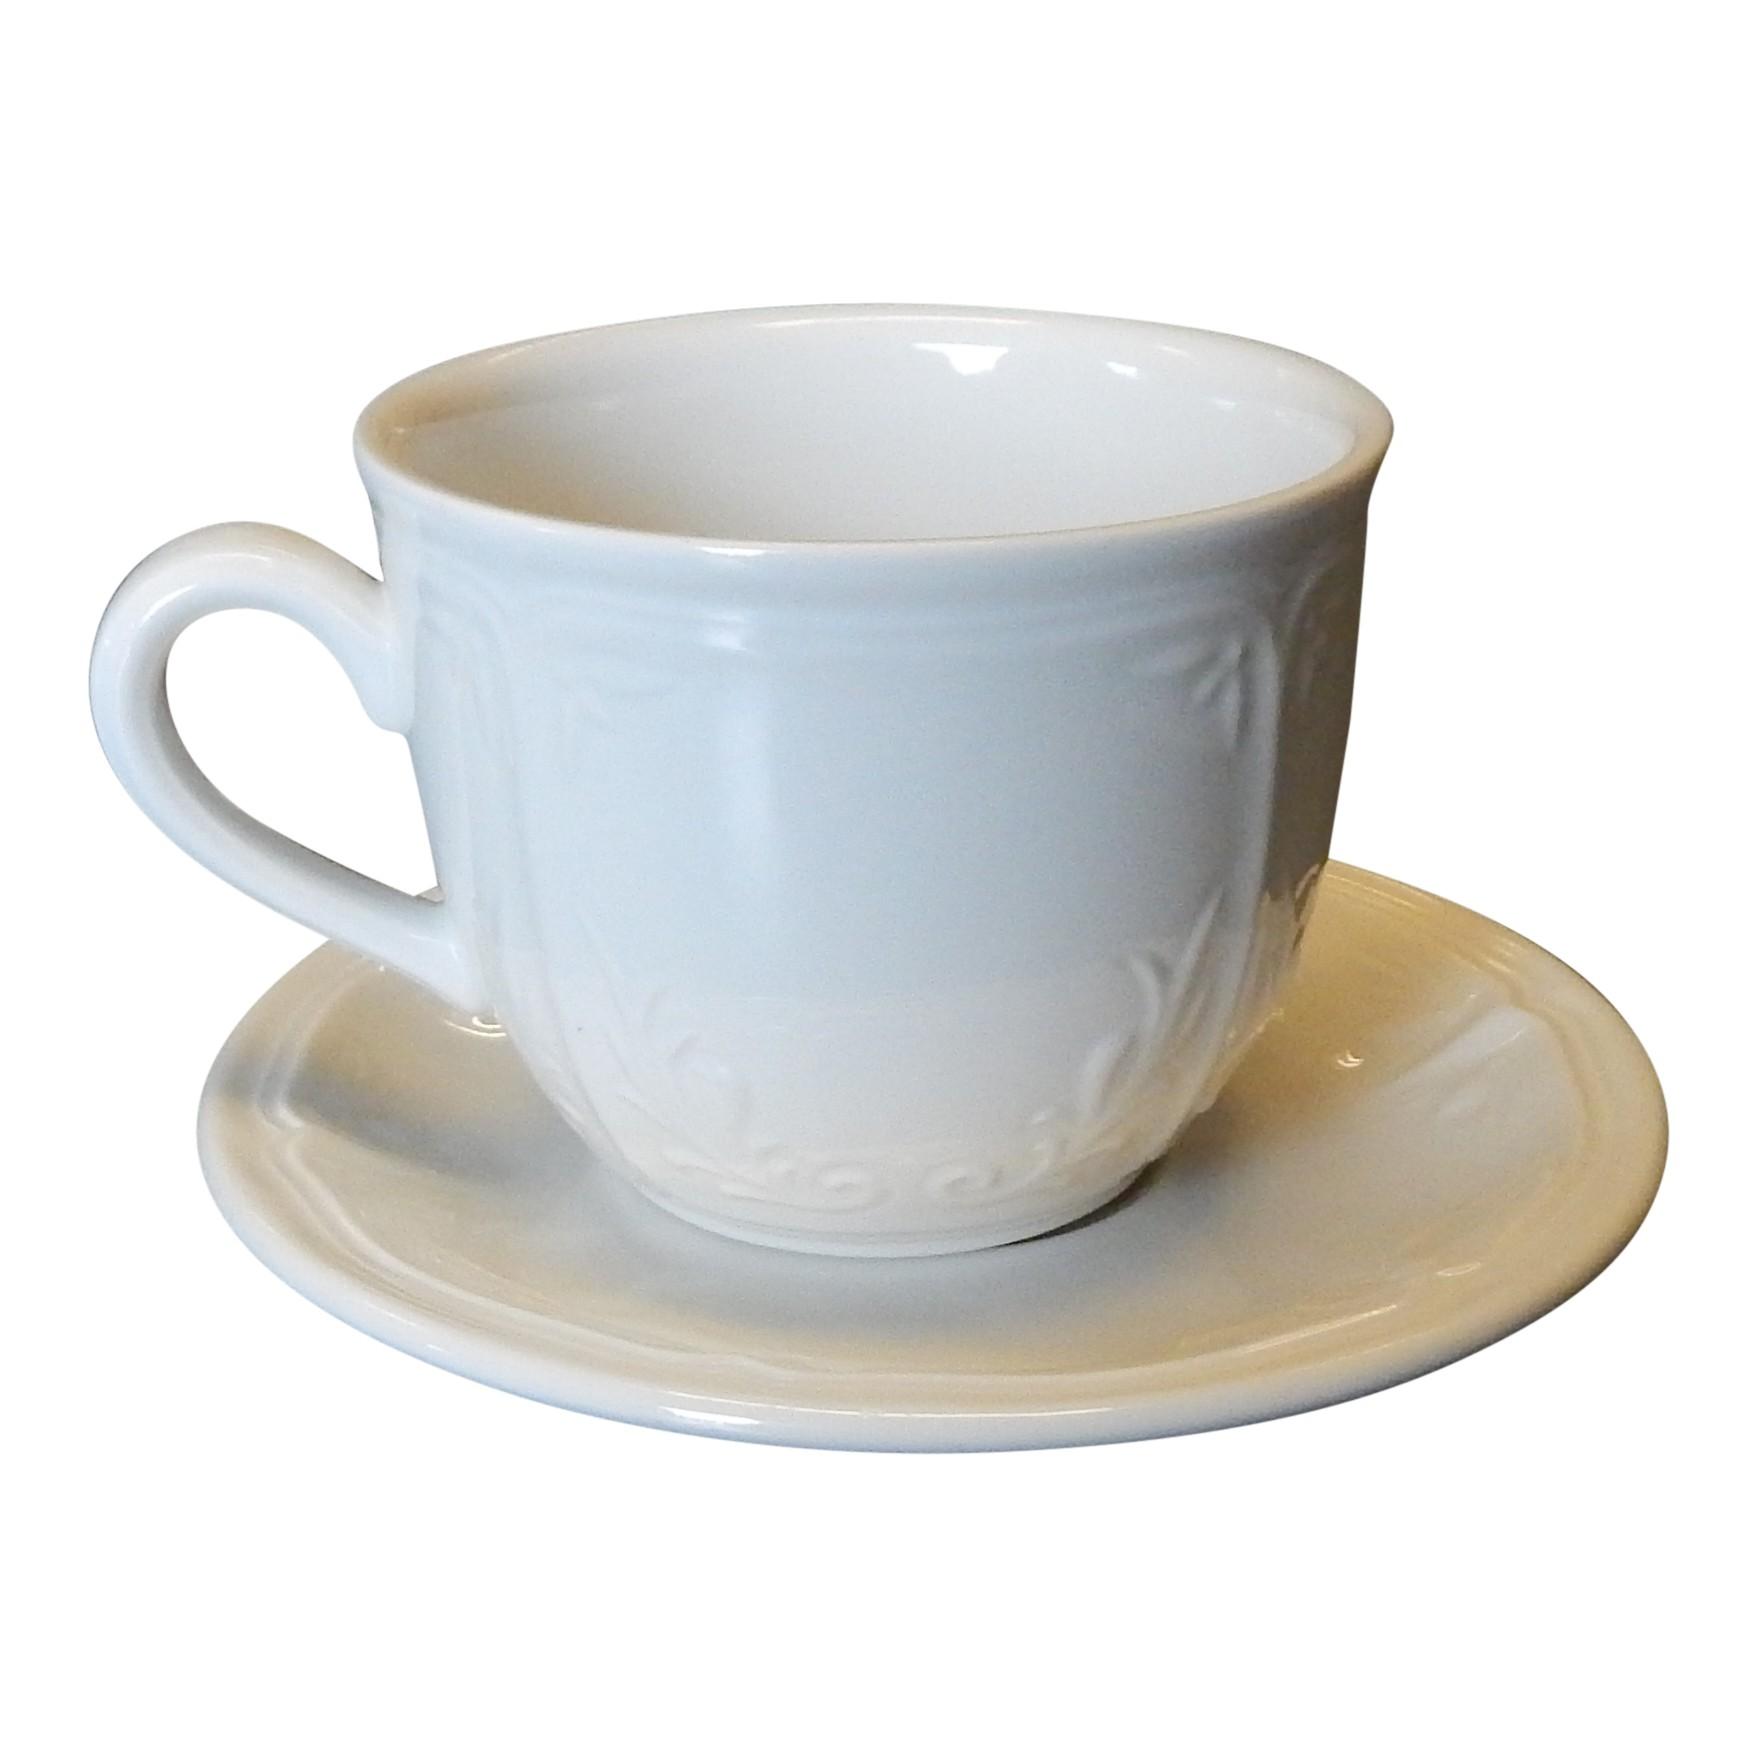 Koffiekop en Schotel vb